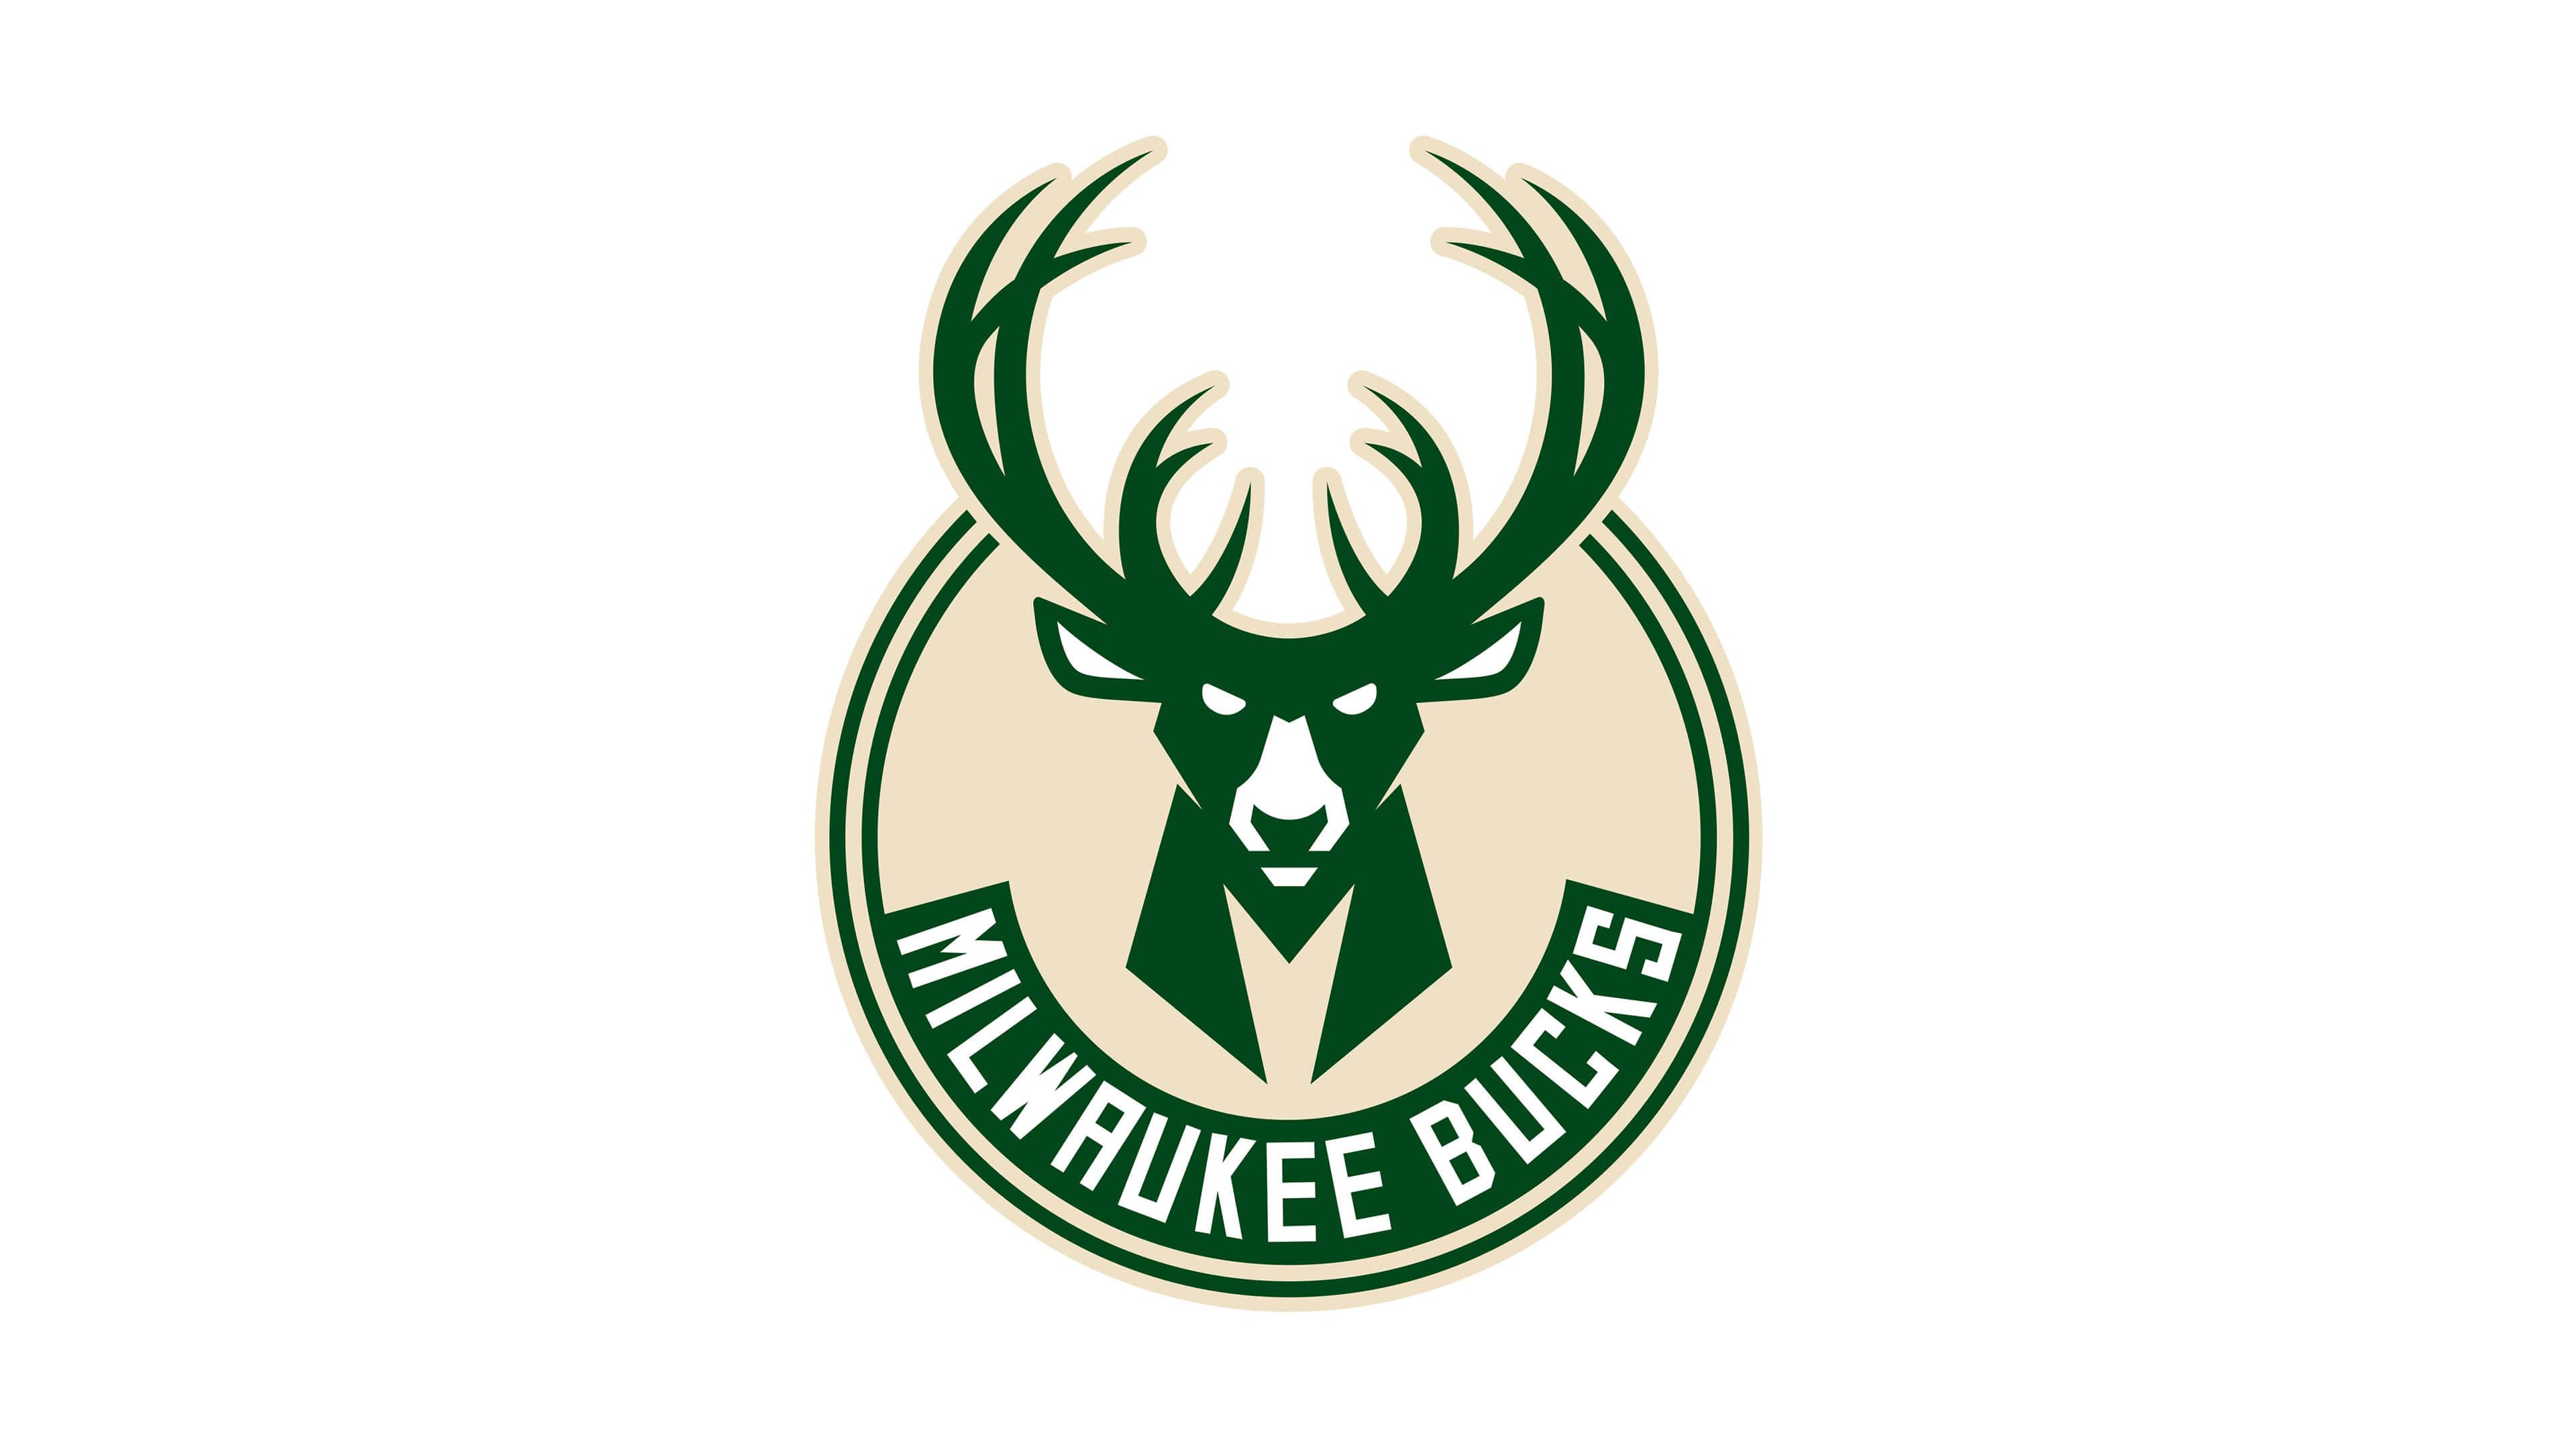 Milwaukee Bucks Nba Logo Uhd 4k Wallpaper Pixelz